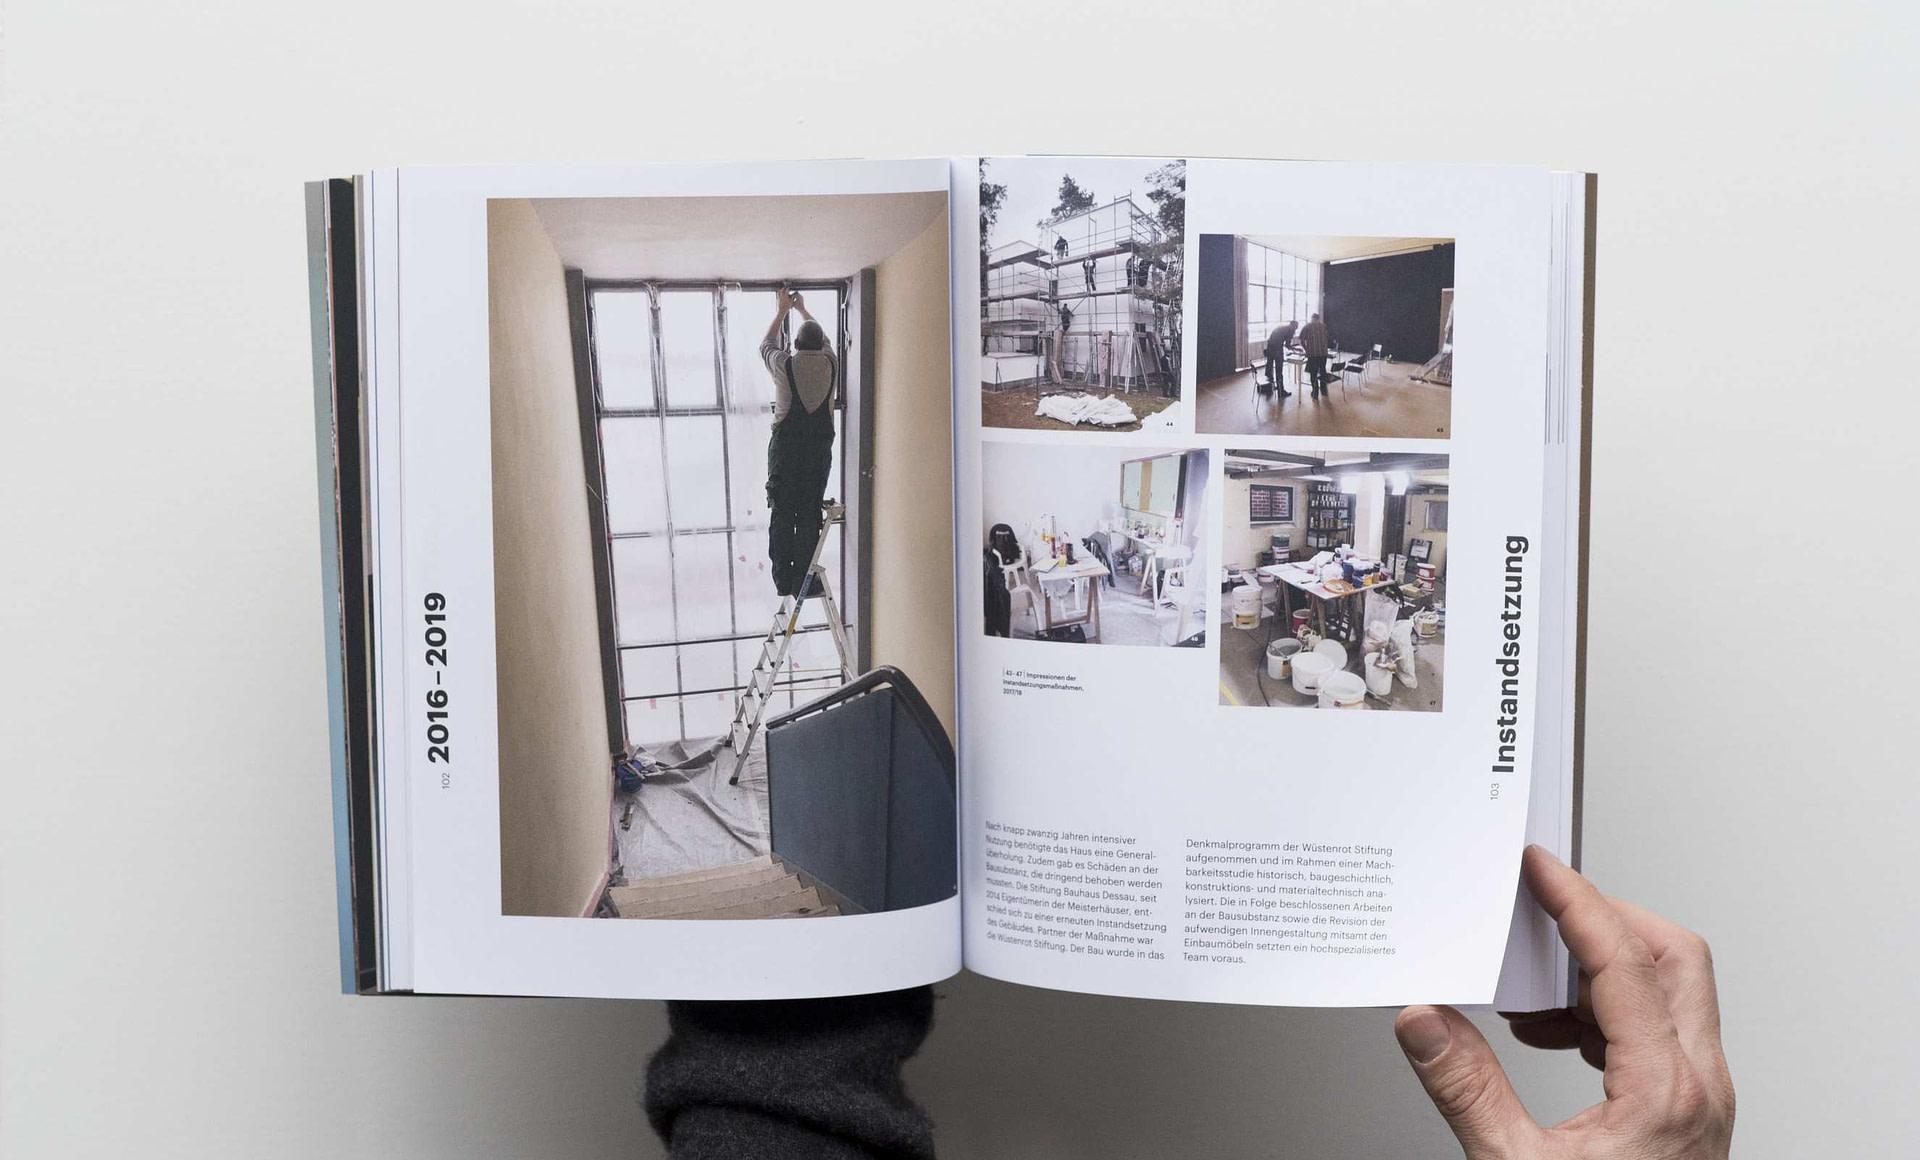 meisterhaus-kandinsky-klee-book-13-2650x1600px